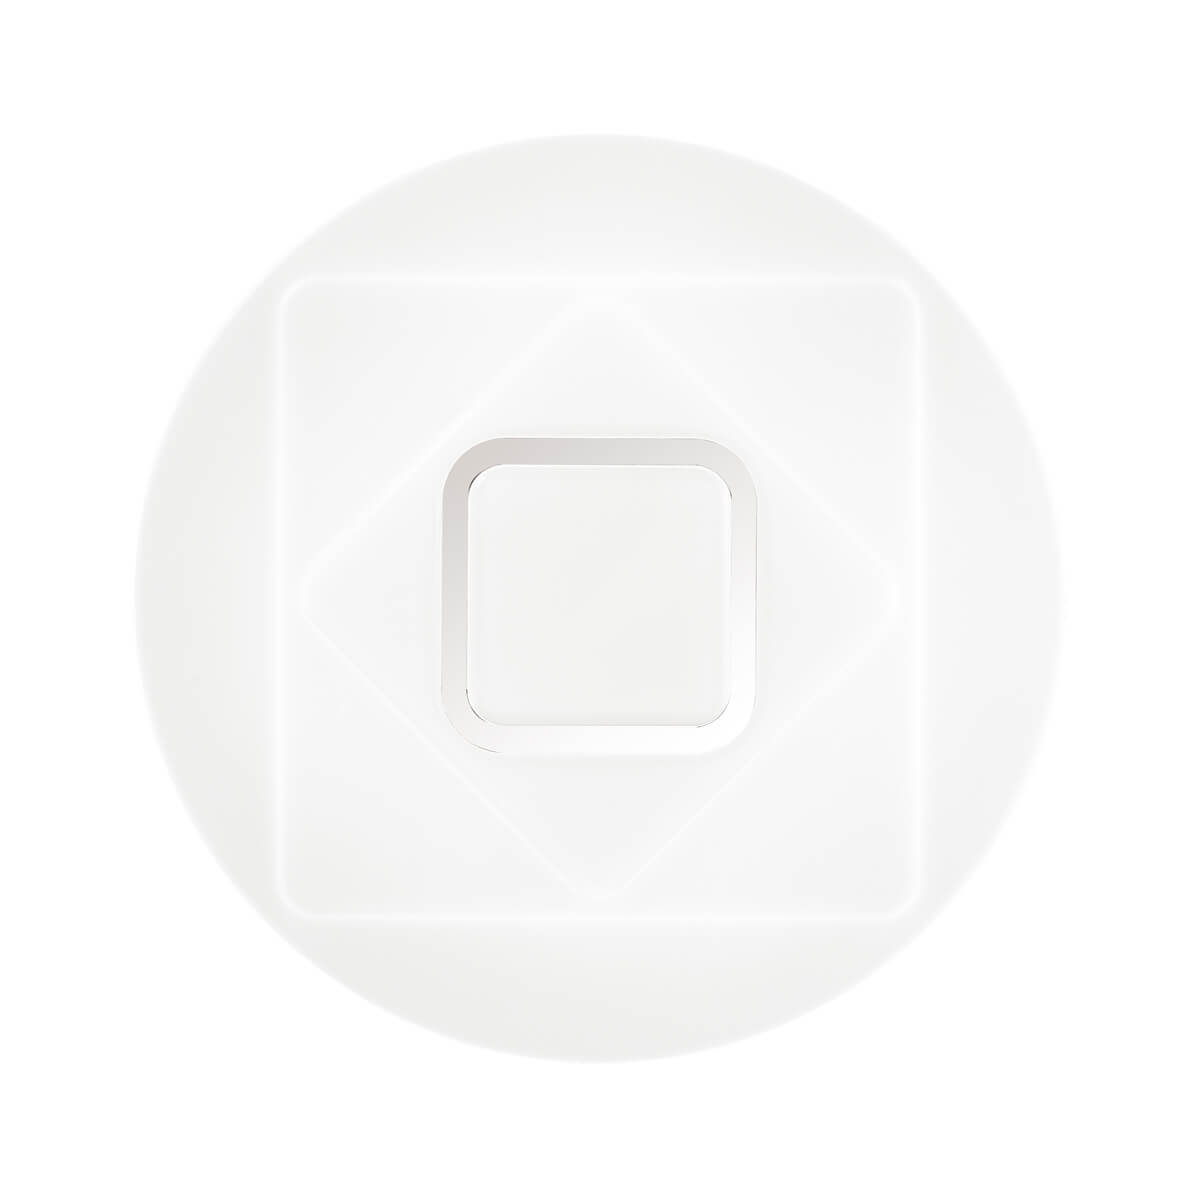 Светильник Sonex 3037/EL светильник sonex 2049 el